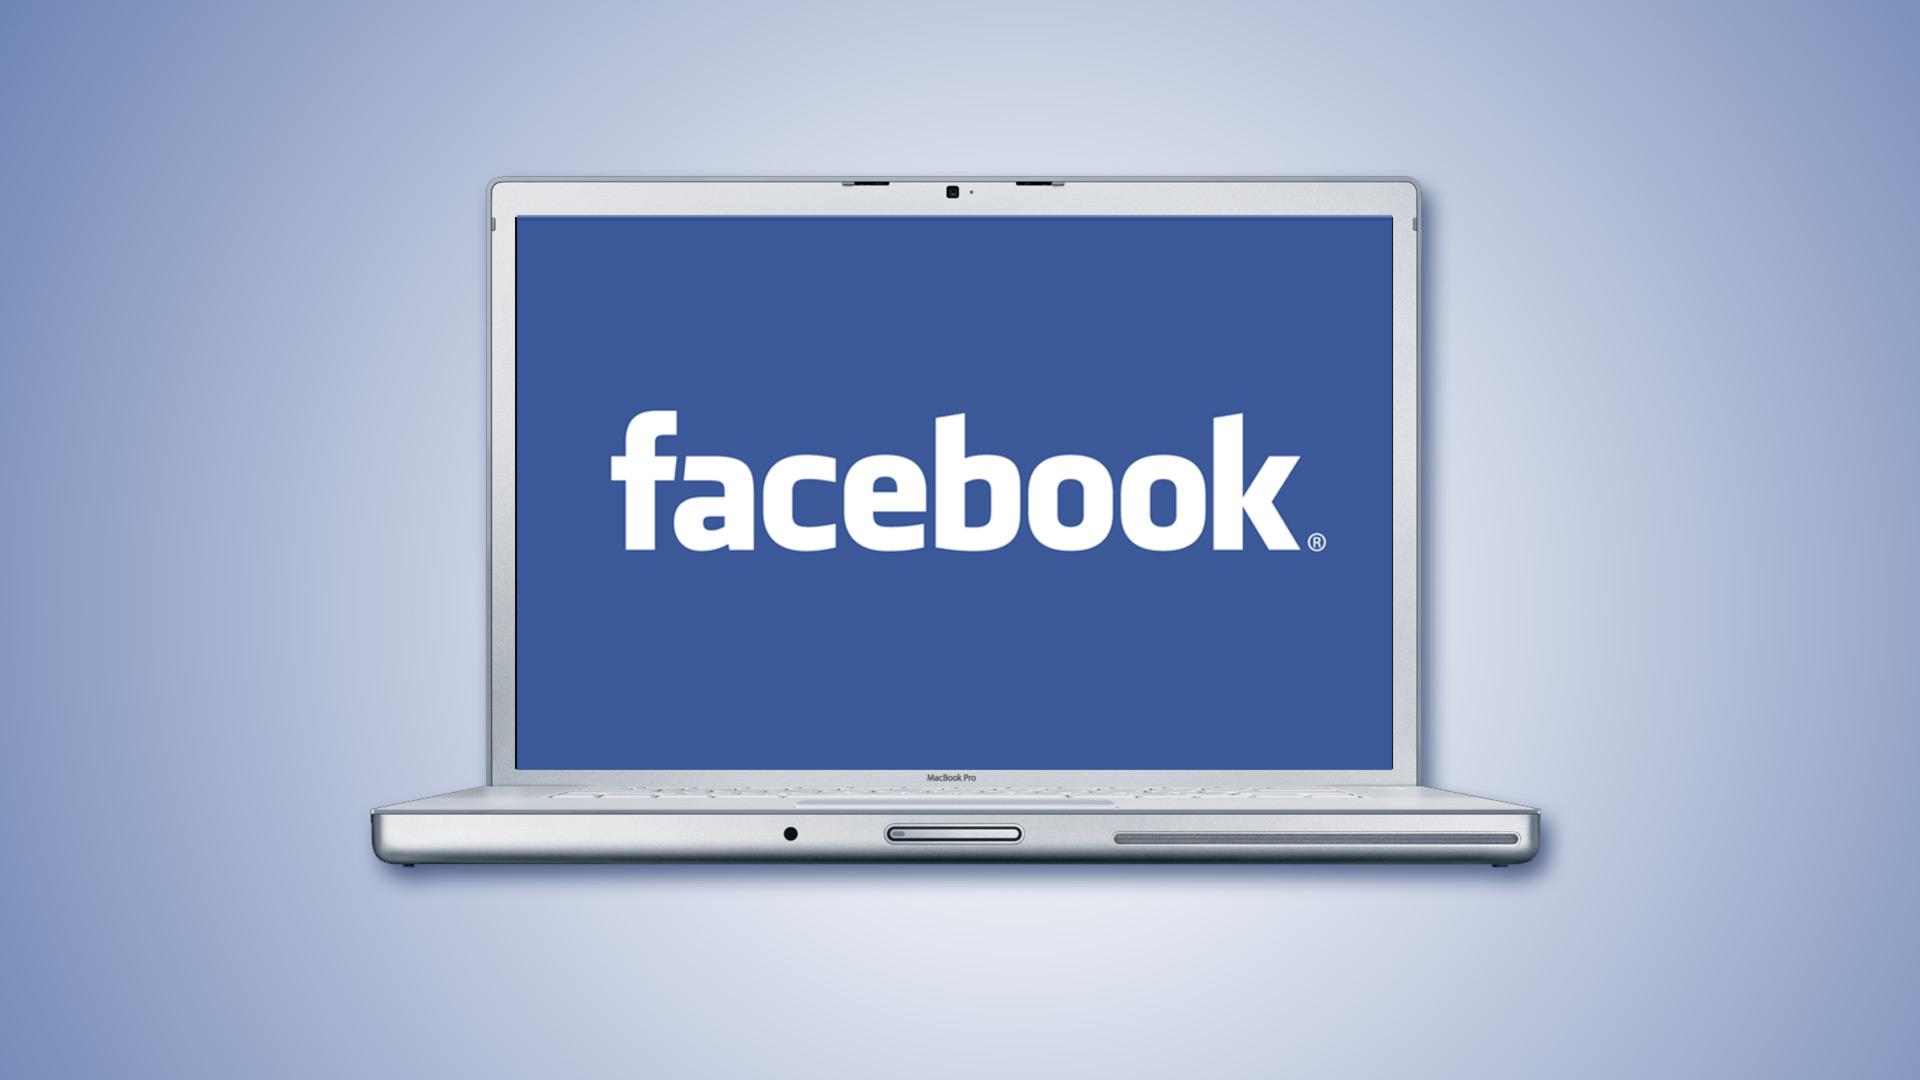 Facebook-logo-on-laptop-screen_61995